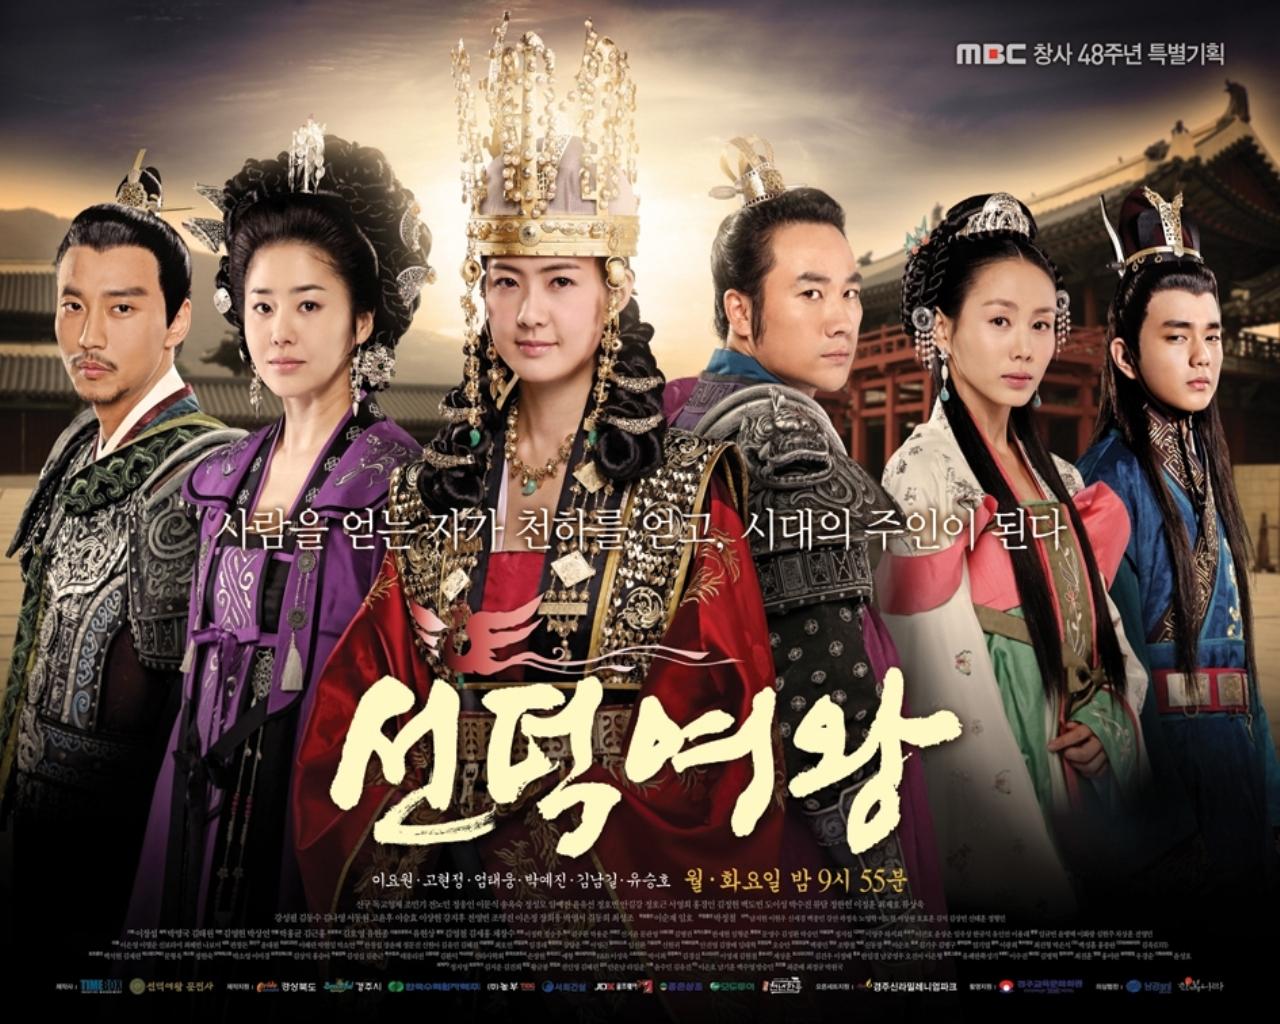 An official poster of the drama. From left to right: Bidam Sangdaedung, Mishil Seju, Deokman Paeha, Kim Yushin Chamgun, Princess Cheonmyong